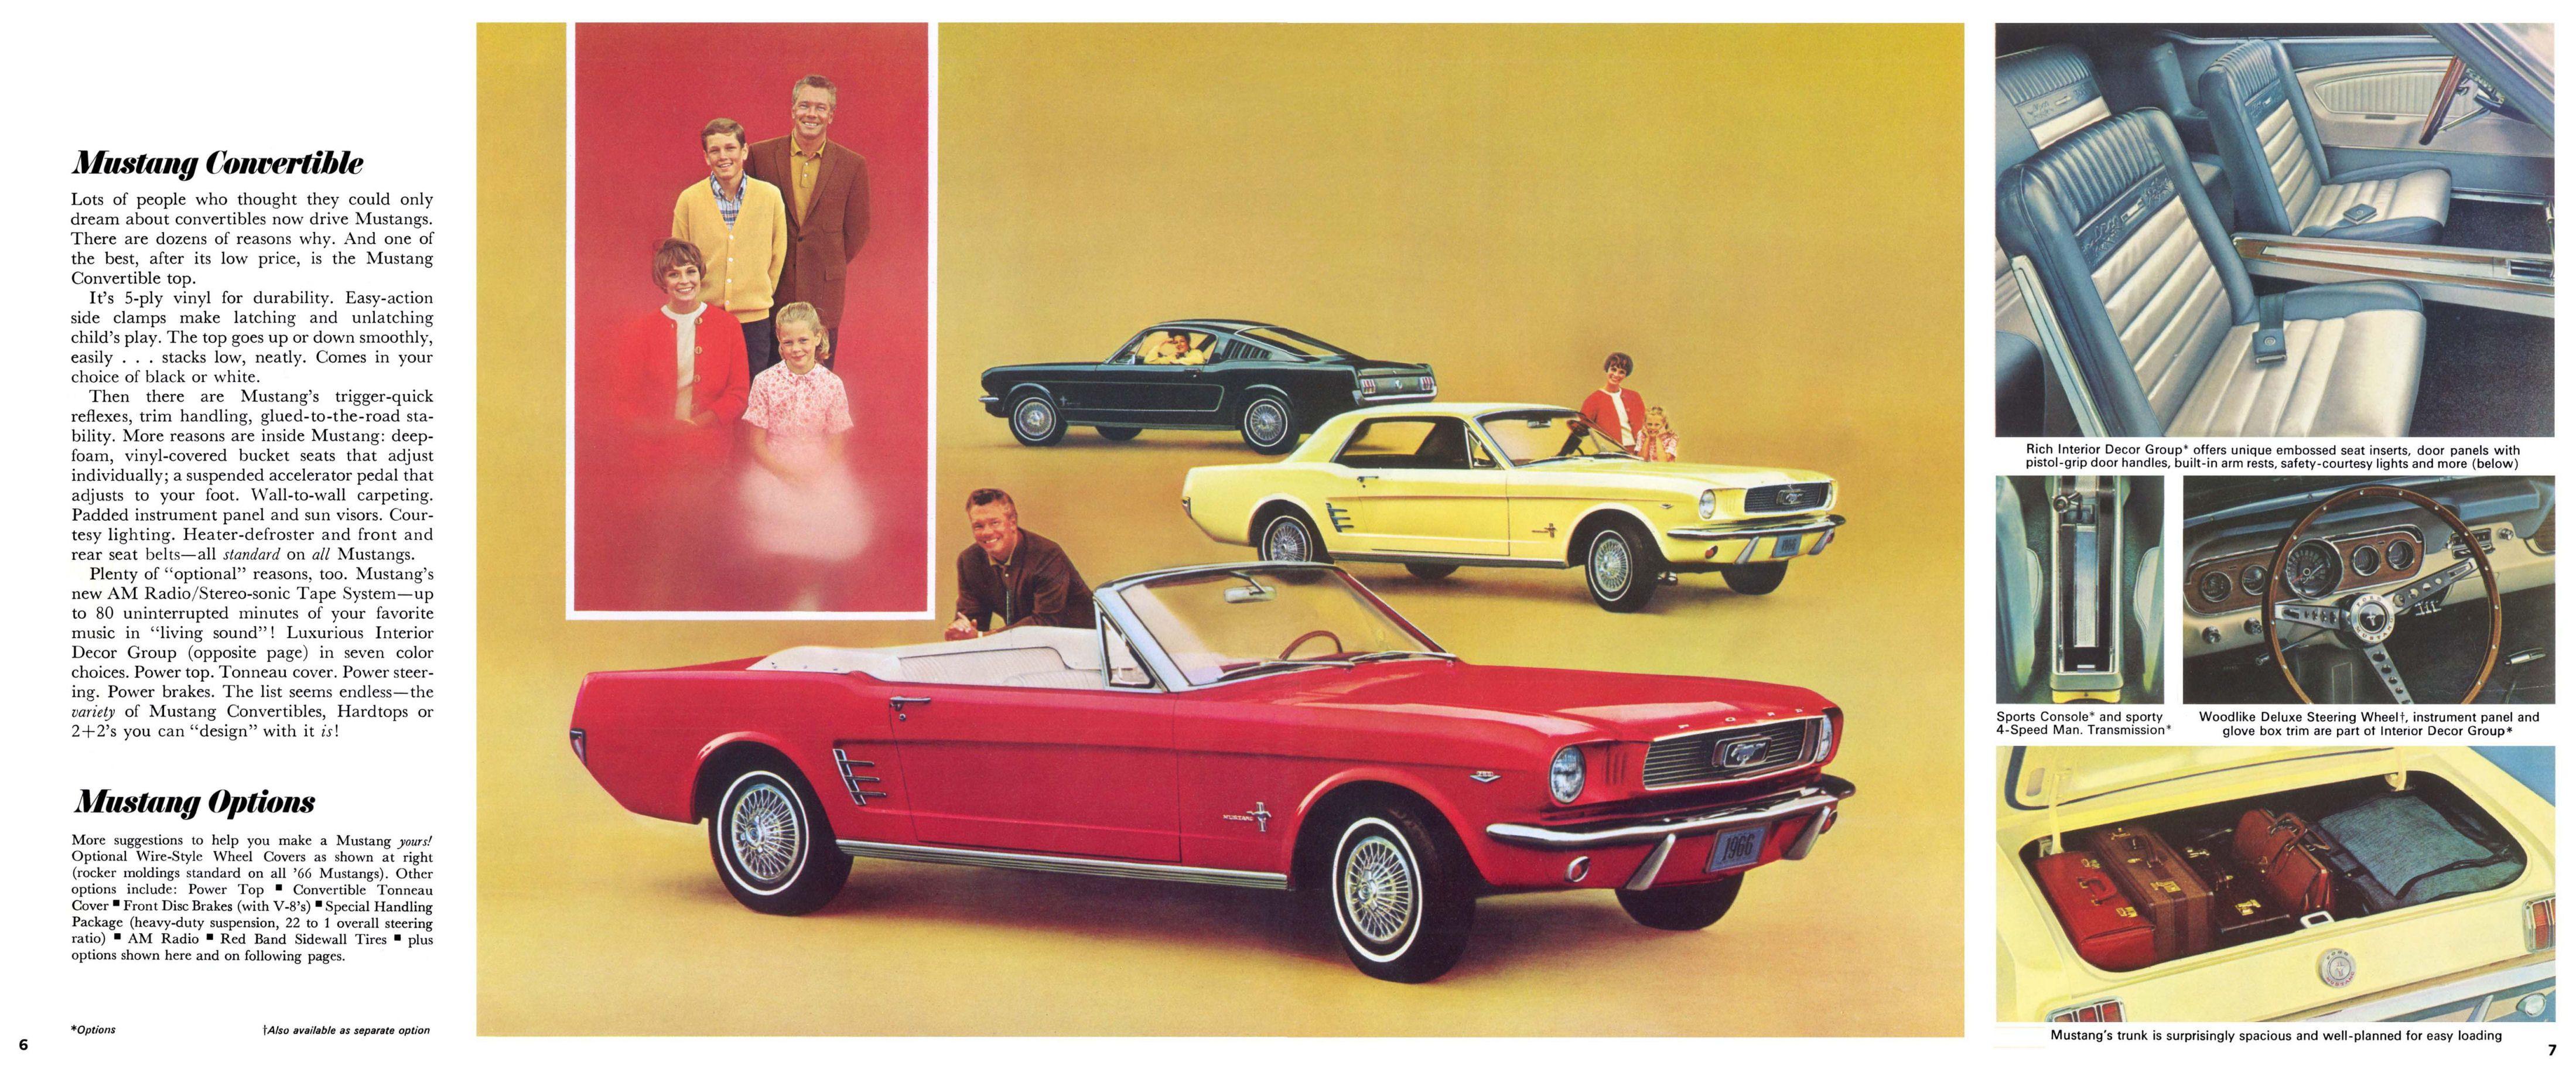 1966 Ford Mustang 06 07 Mustang 1966 Ford Mustang Ford Mustang